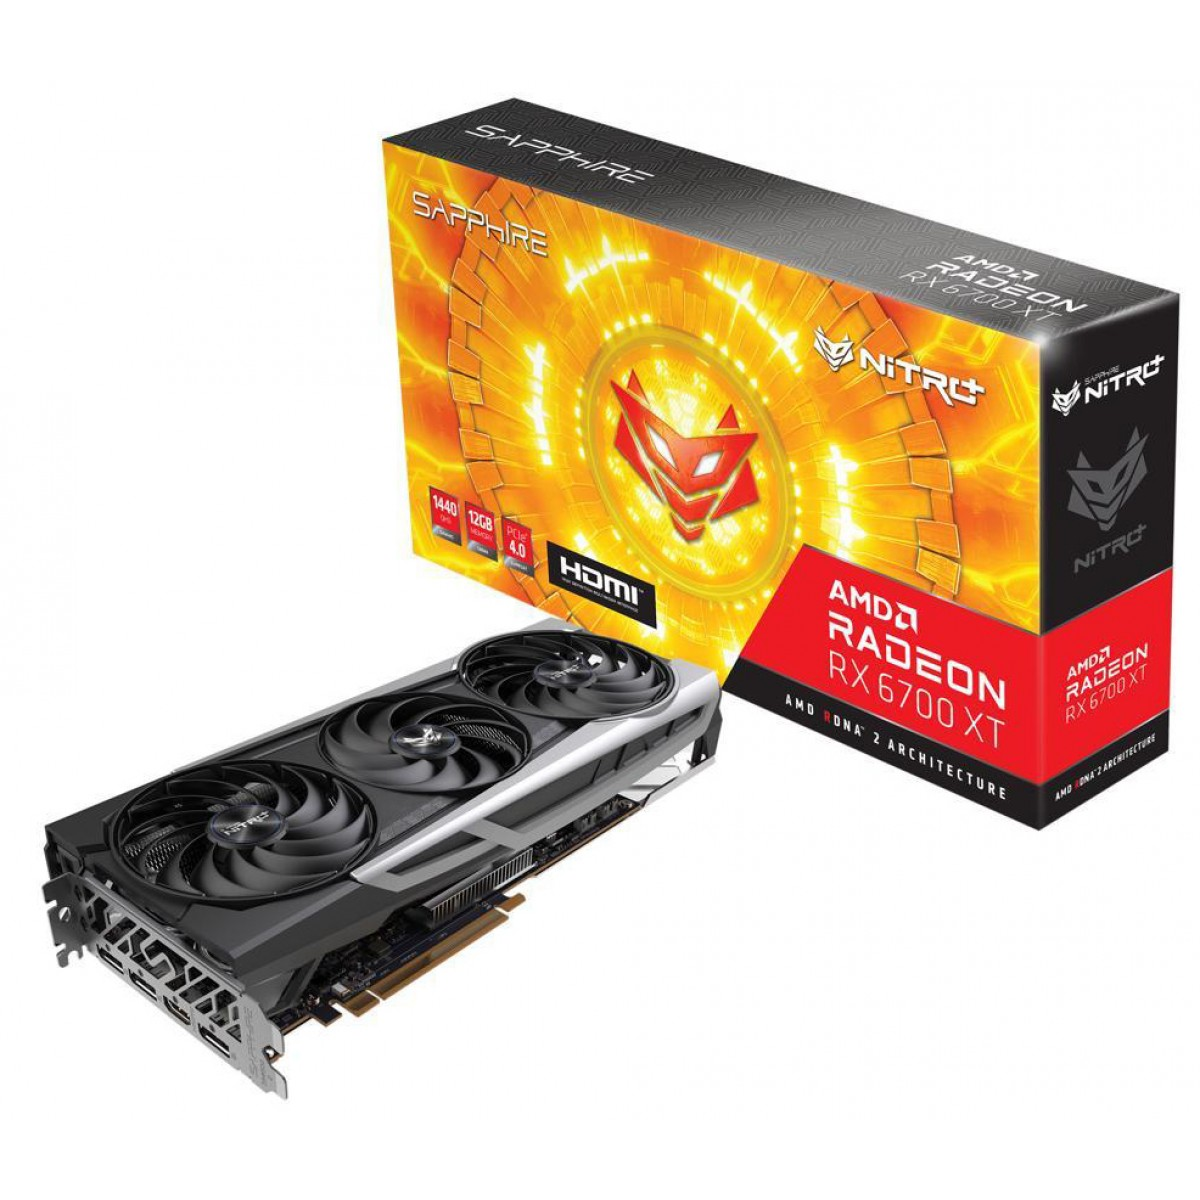 Kit Upgrade Sapphire Radeon Nitro+ AMD Radeon RX 6700 XT + AMD Ryzen 7 5800X + Brinde Jogo Dirt 5